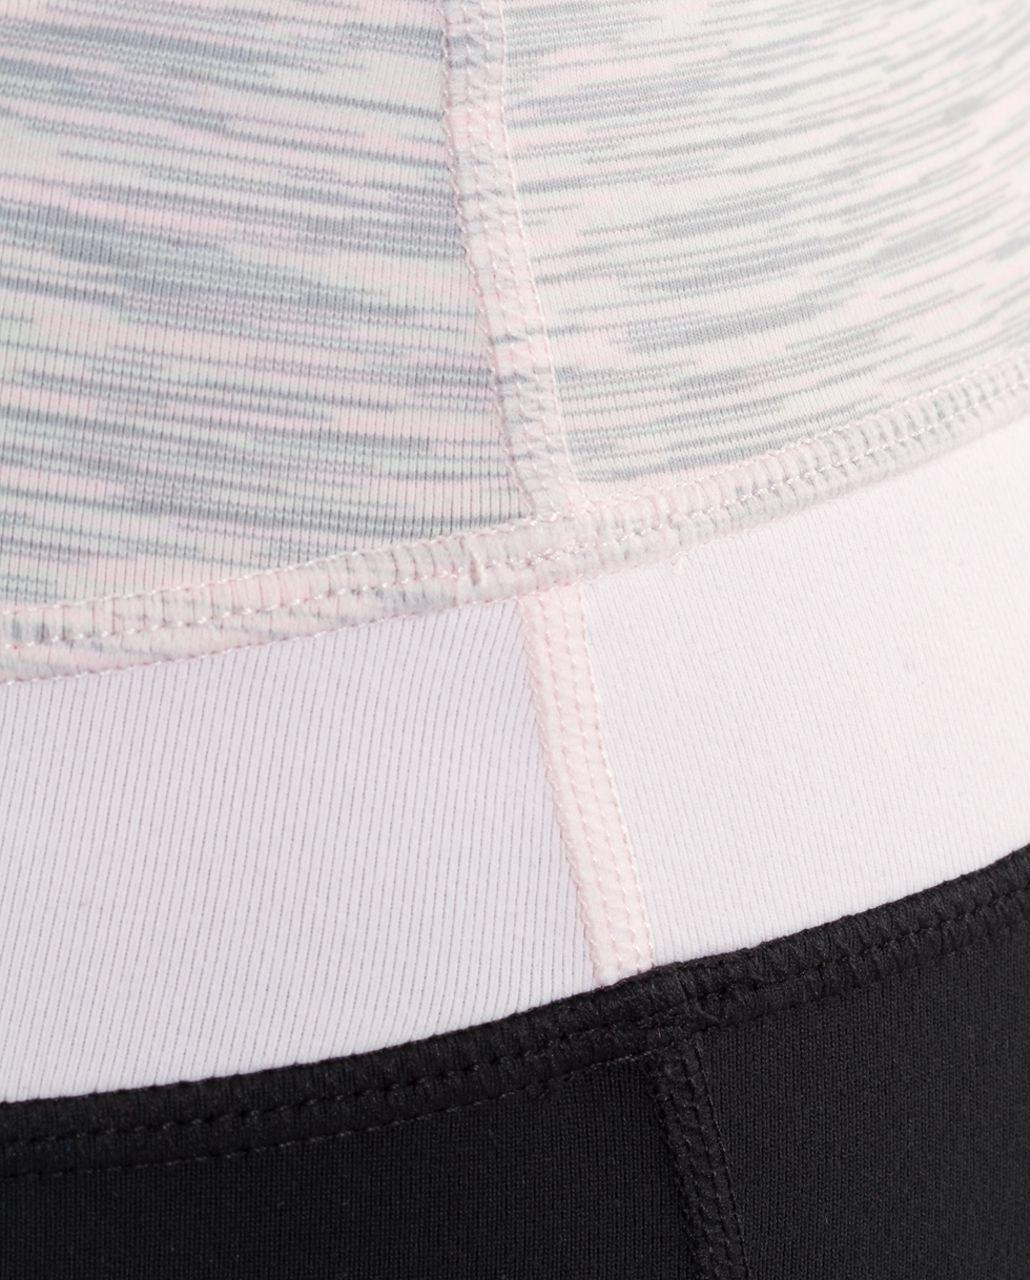 Lululemon Groove Pant (Regular) - Black /  Pink Mist Space Dye /  Pink Mist